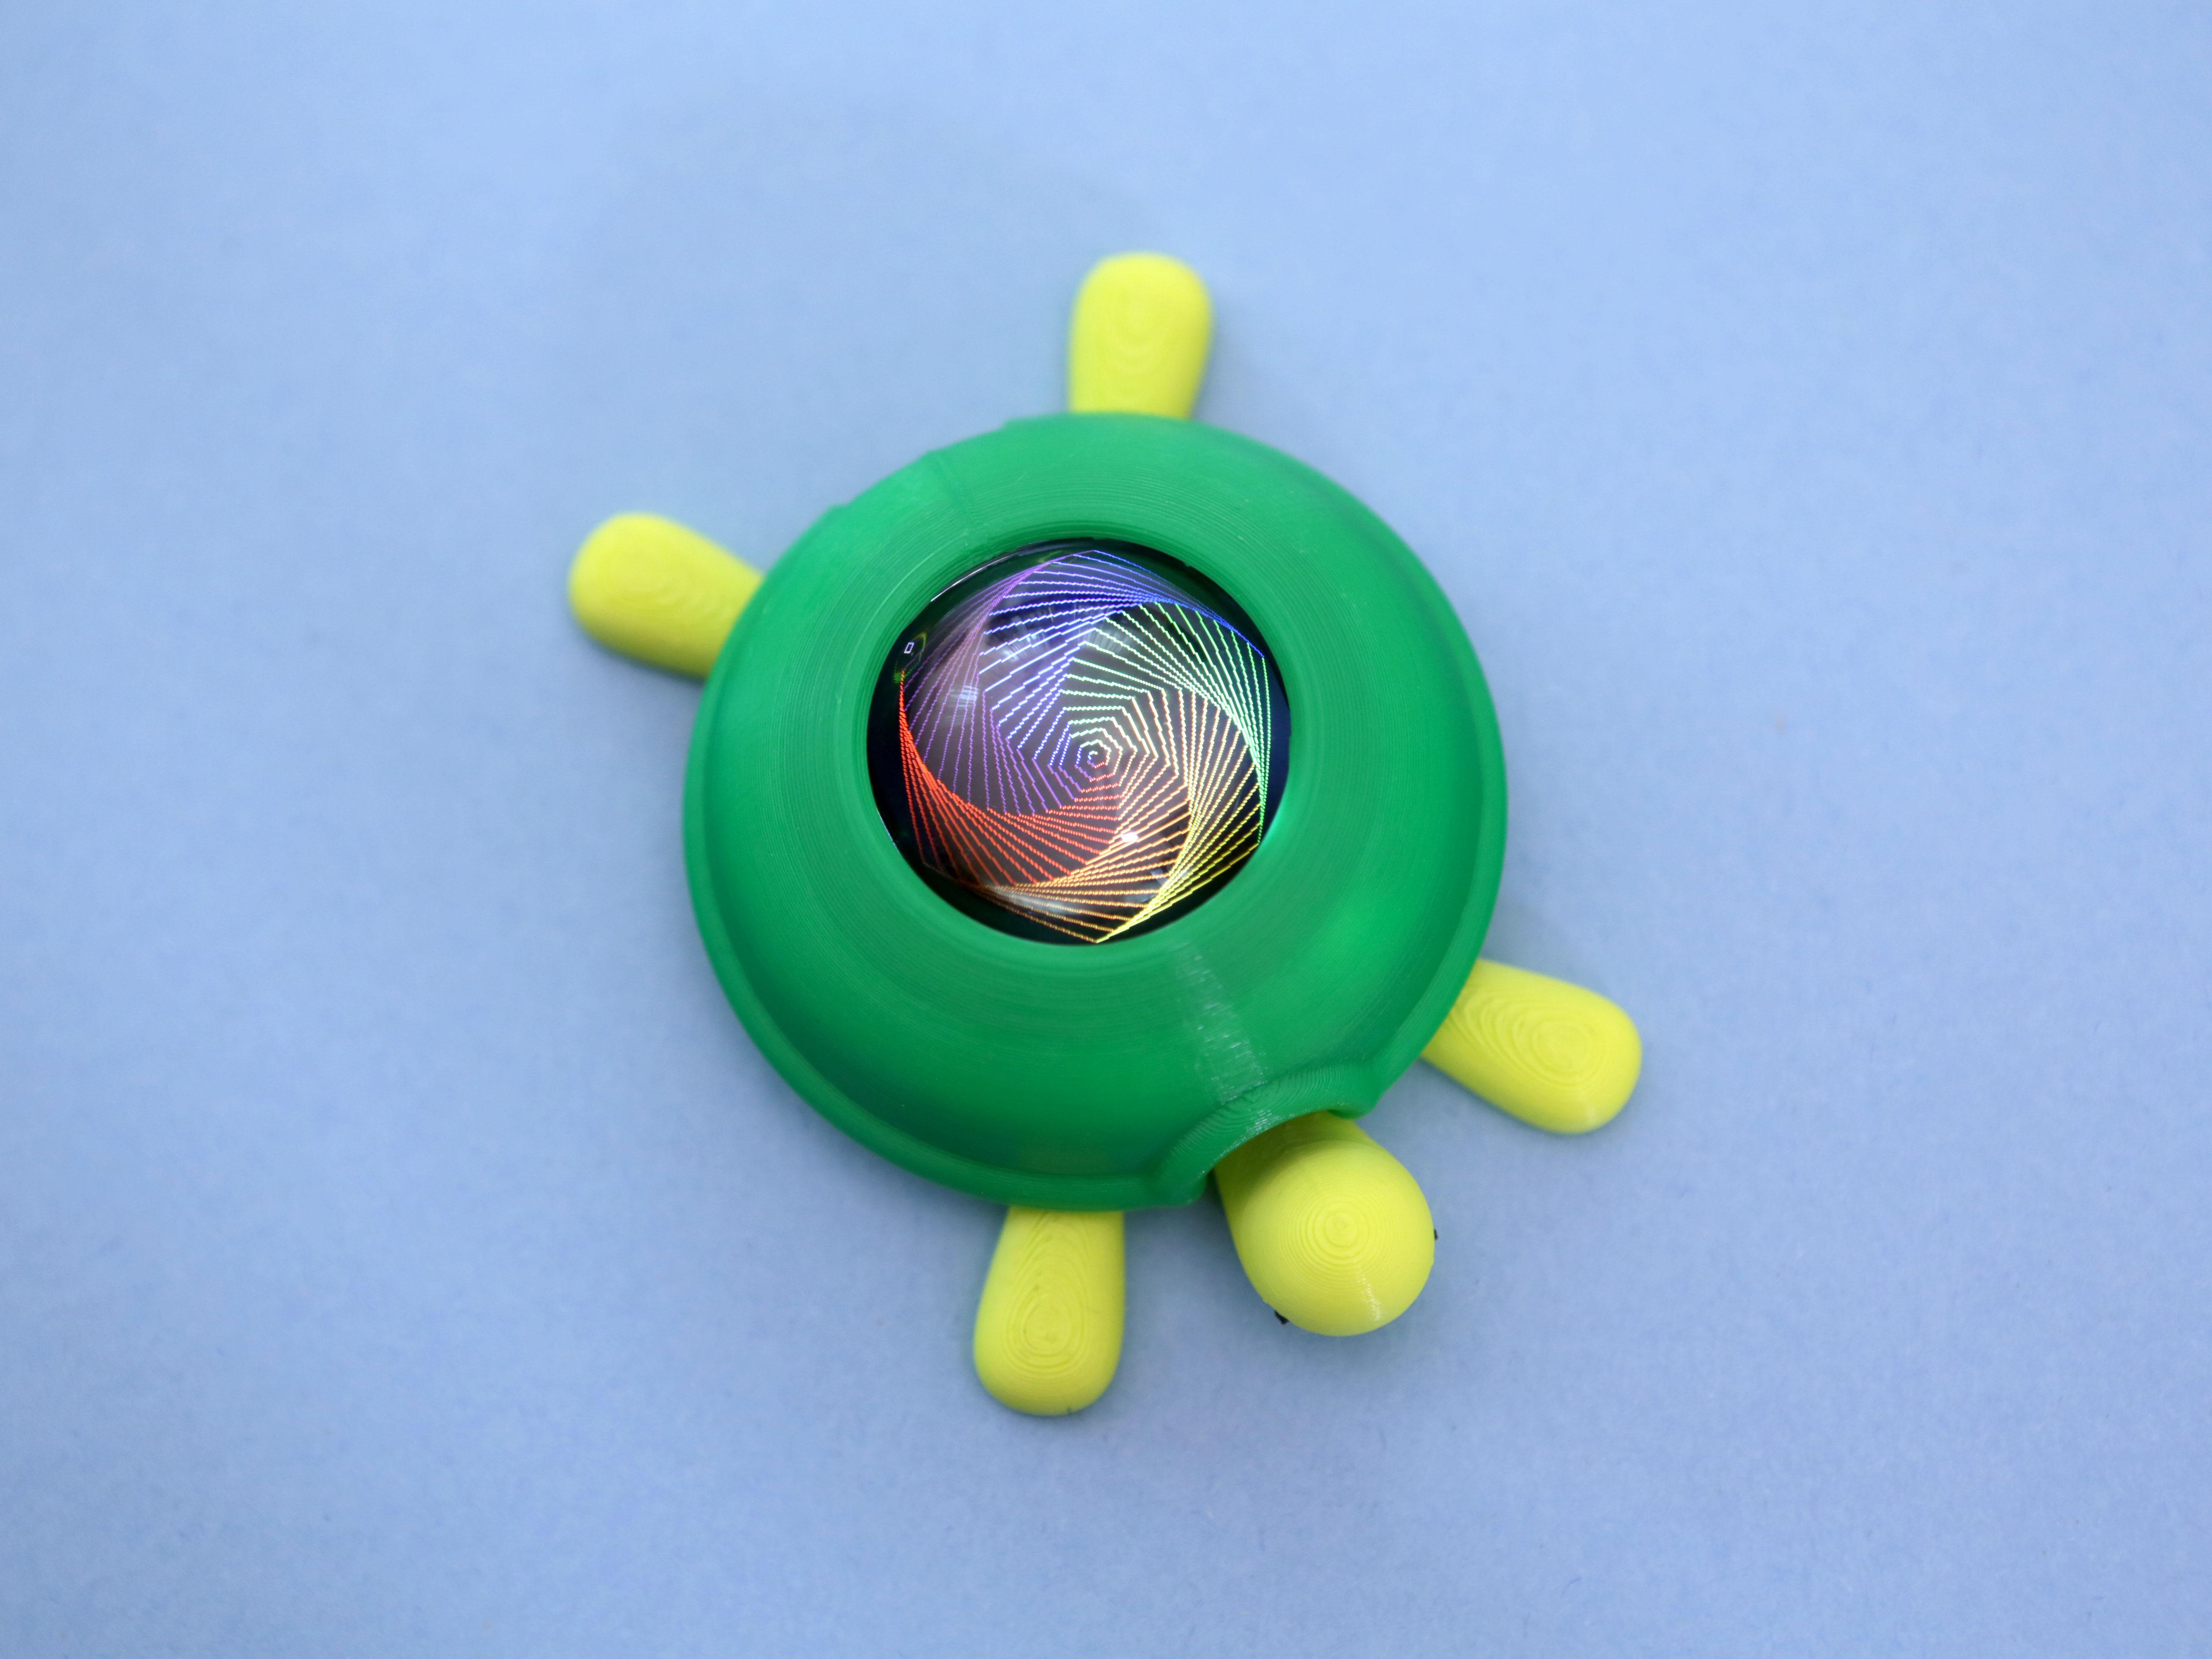 3d_printing_turtle-benzene.jpg